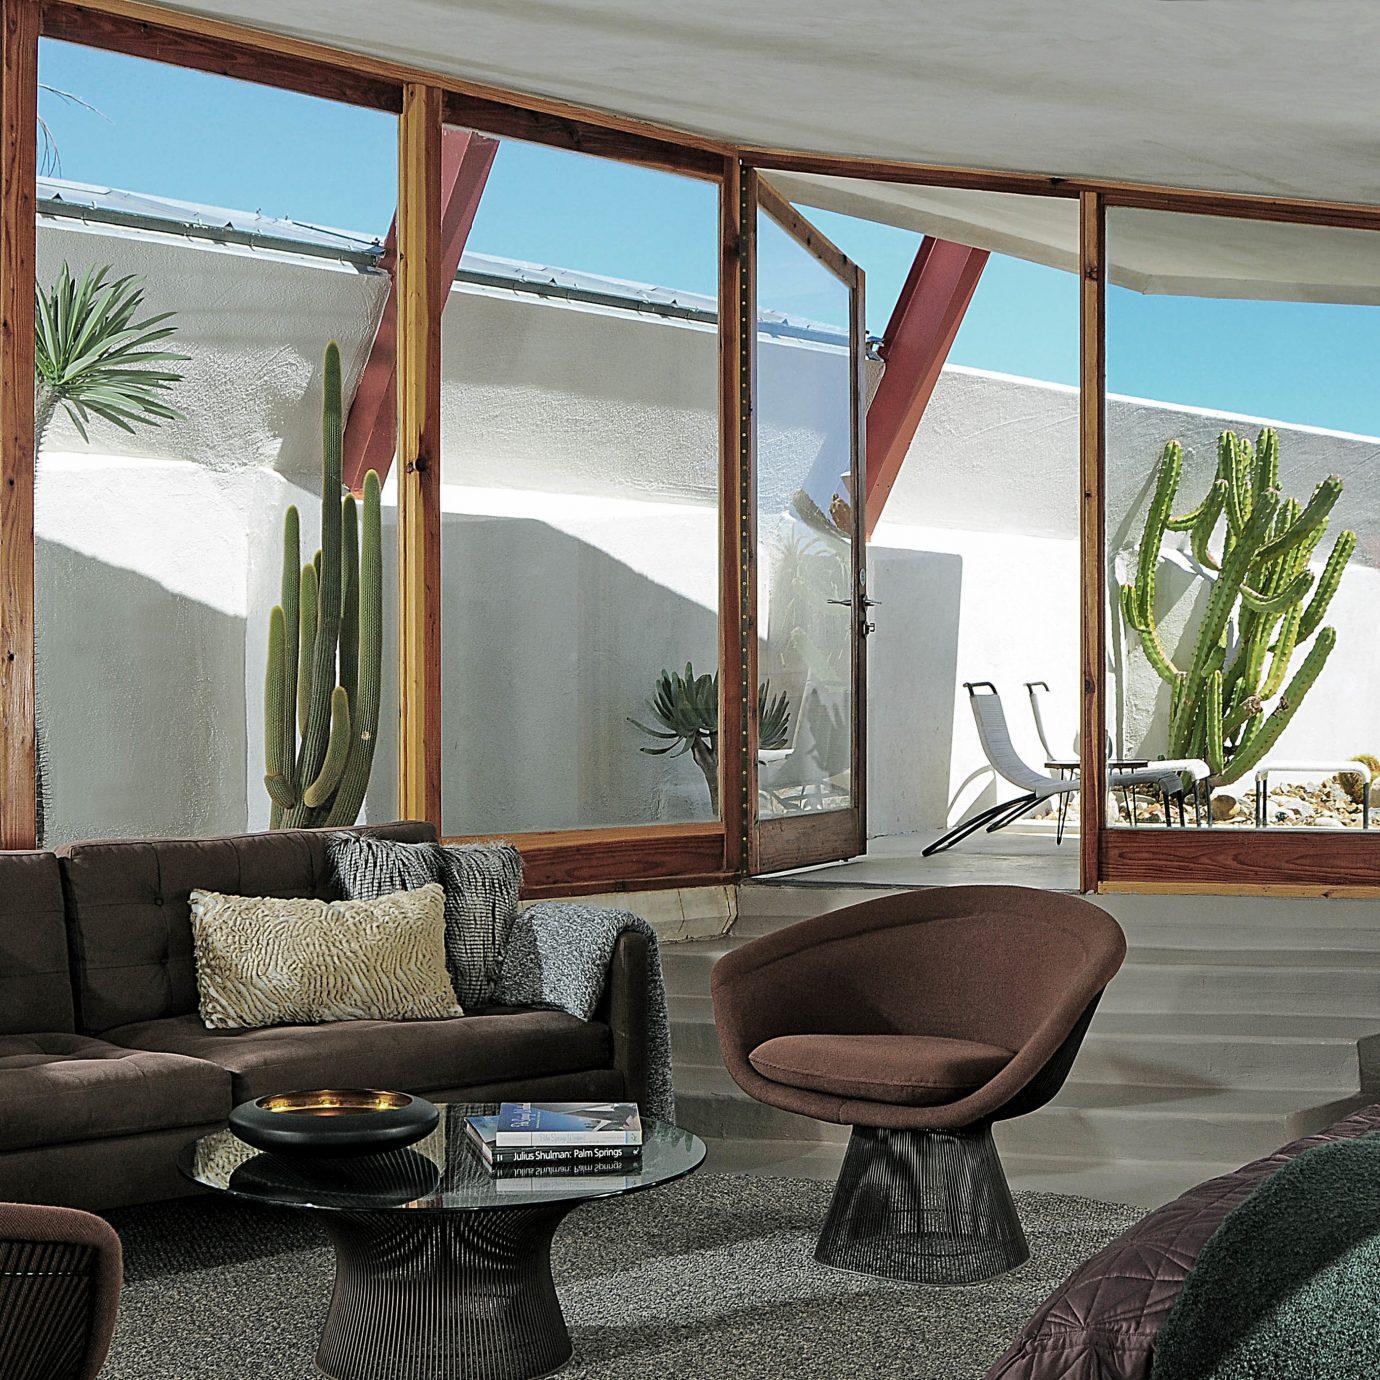 Hip Hotels Lounge Luxury Modern Style + Design Trip Ideas property house living room home condominium cottage porch Villa